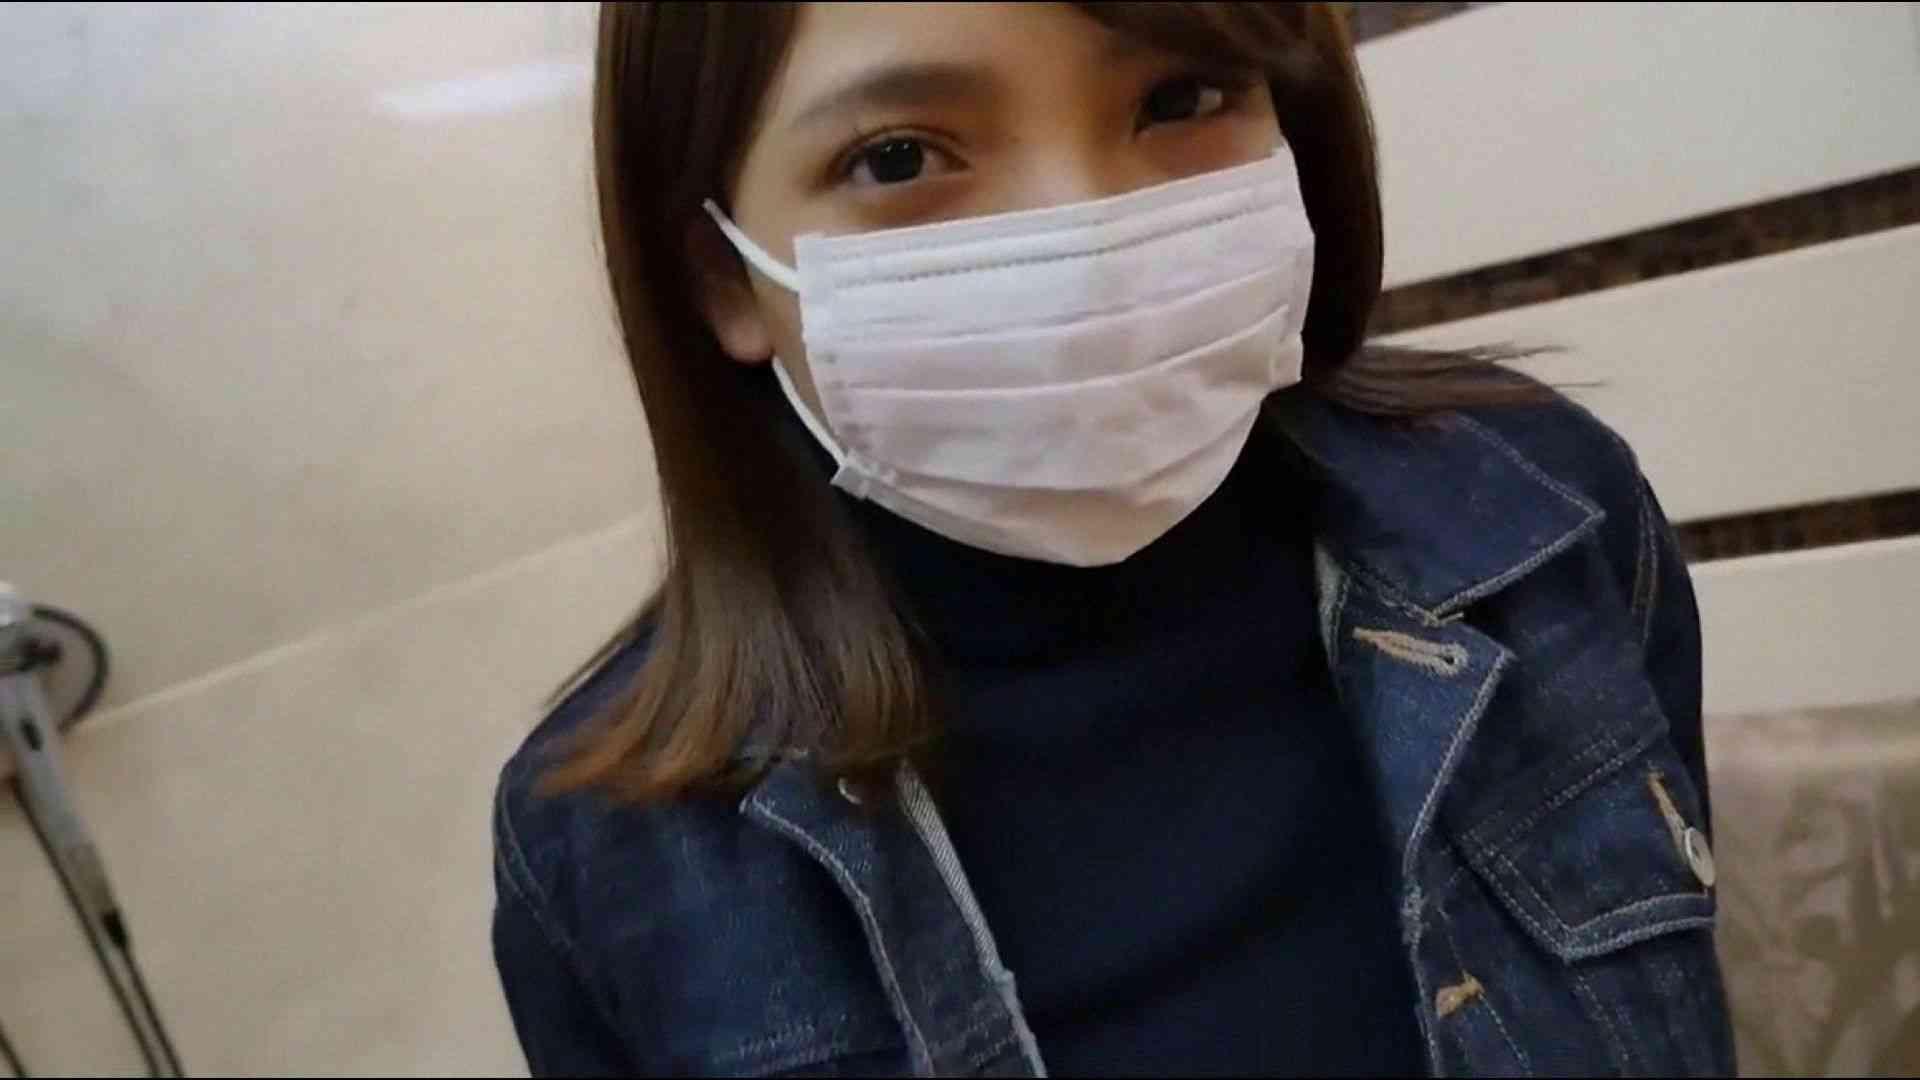 S級厳選美女ビッチガールVol.41 前編 OL女体   美女  105連発 15